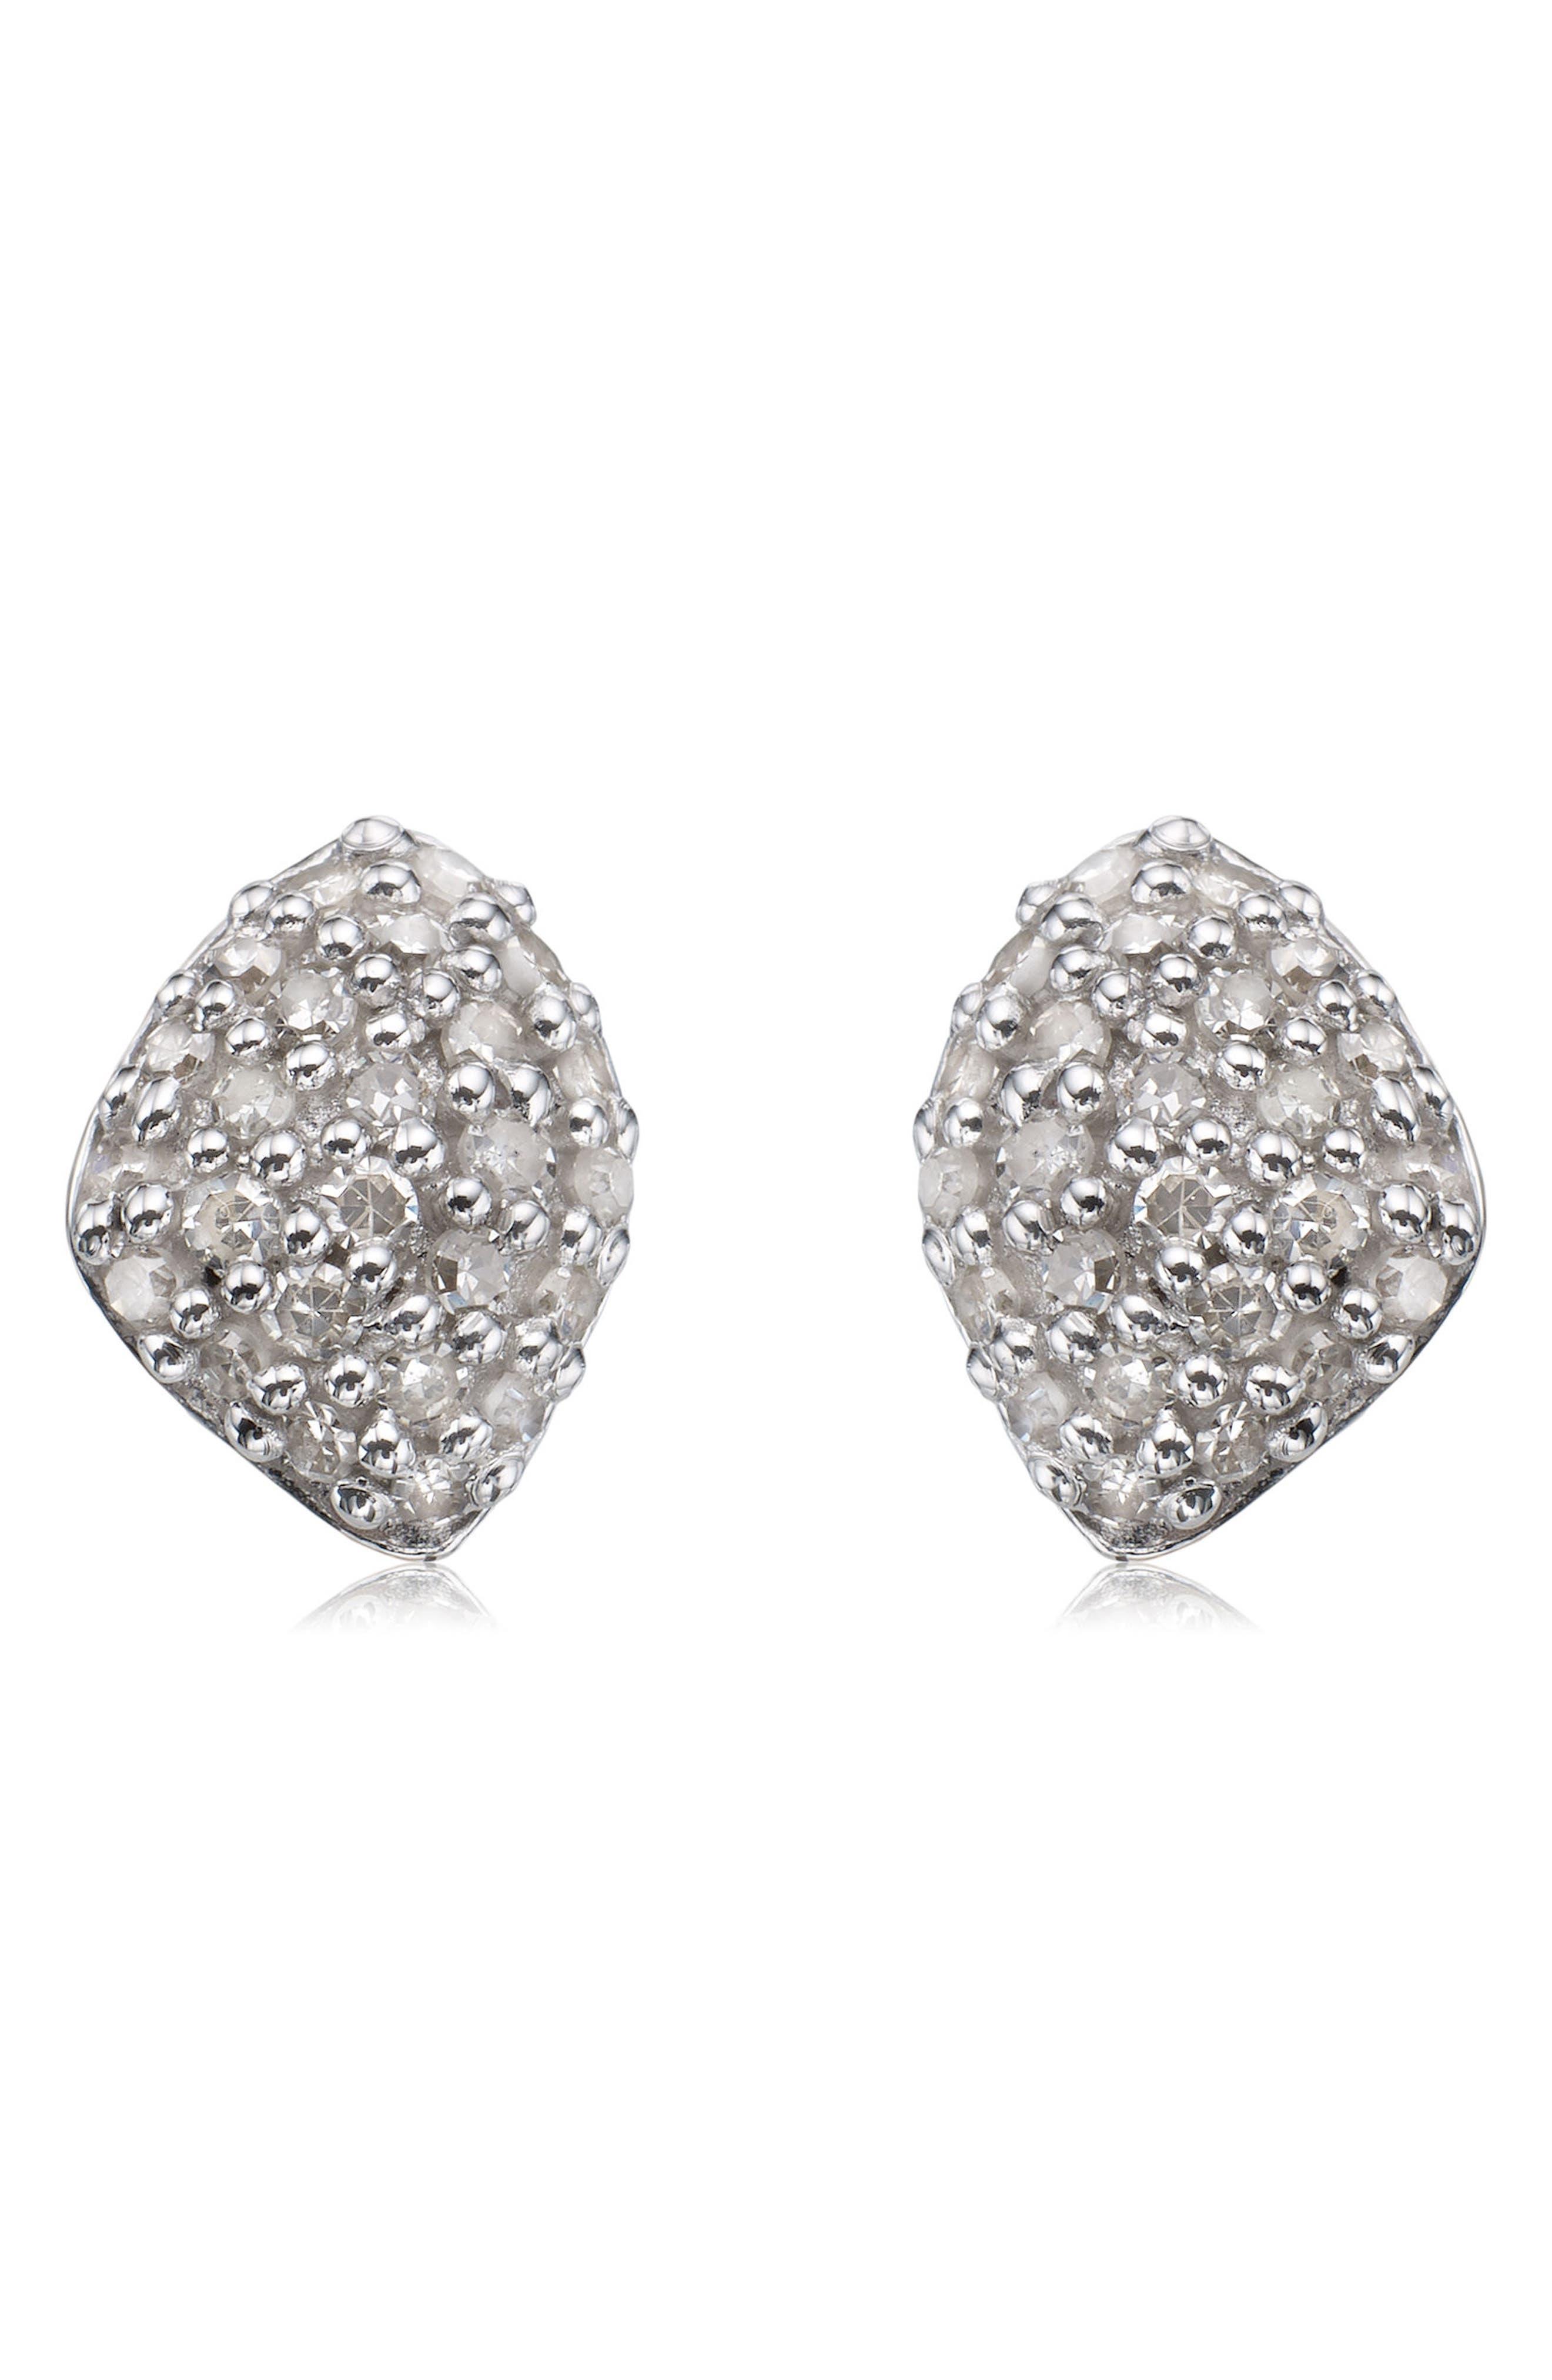 MONICA VINADER Nura Mini Diamond Stud Earrings, Main, color, ROSE GOLD/ DIAMOND